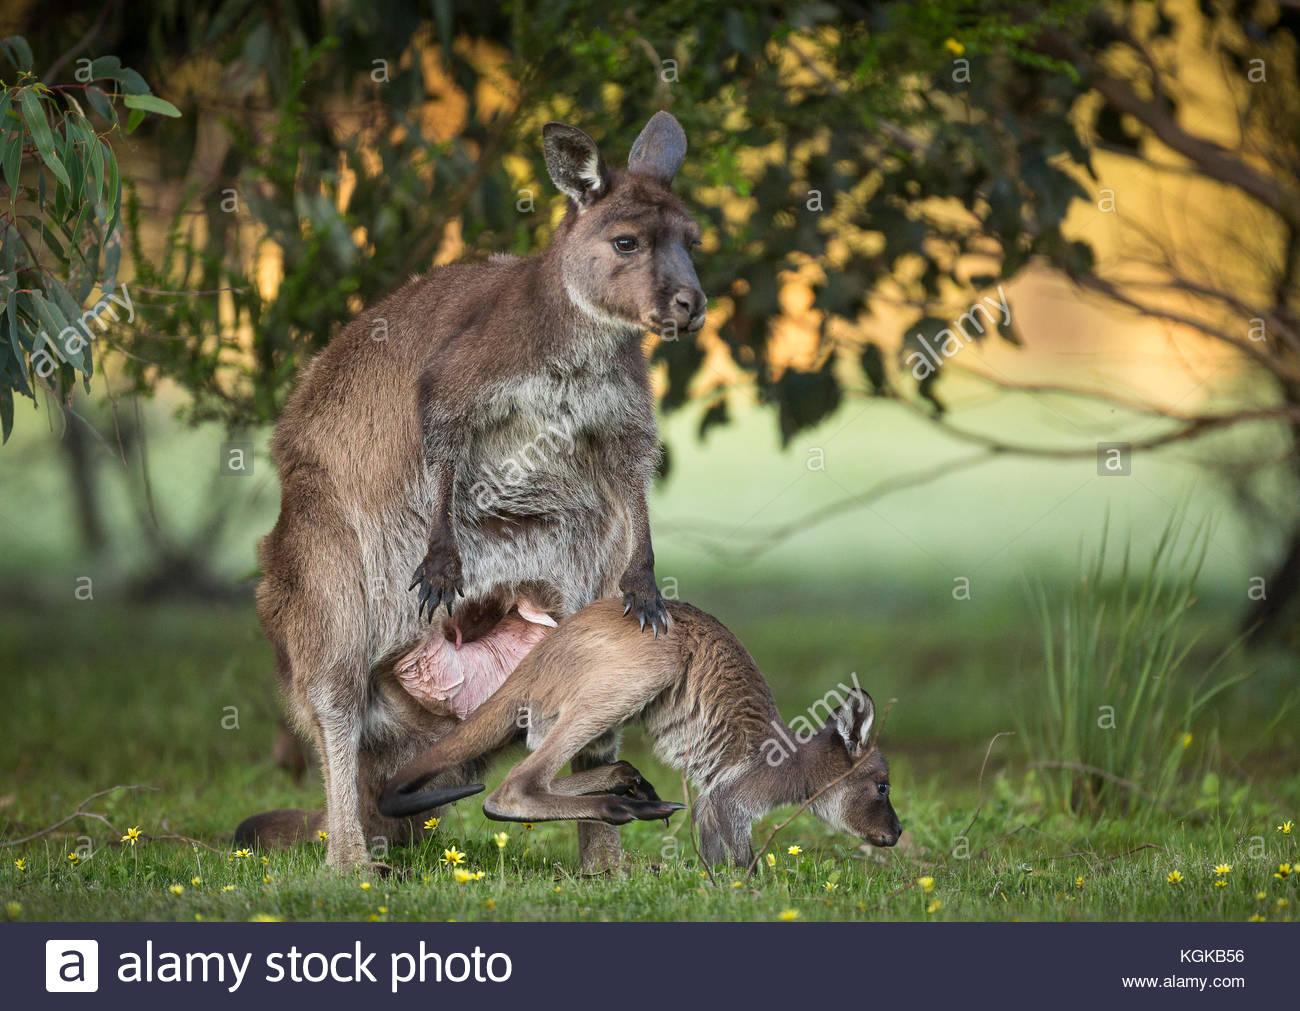 Un occidentale Canguro grigio joey emergente dalla sacca, Macropus fuliginosus. Foto Stock